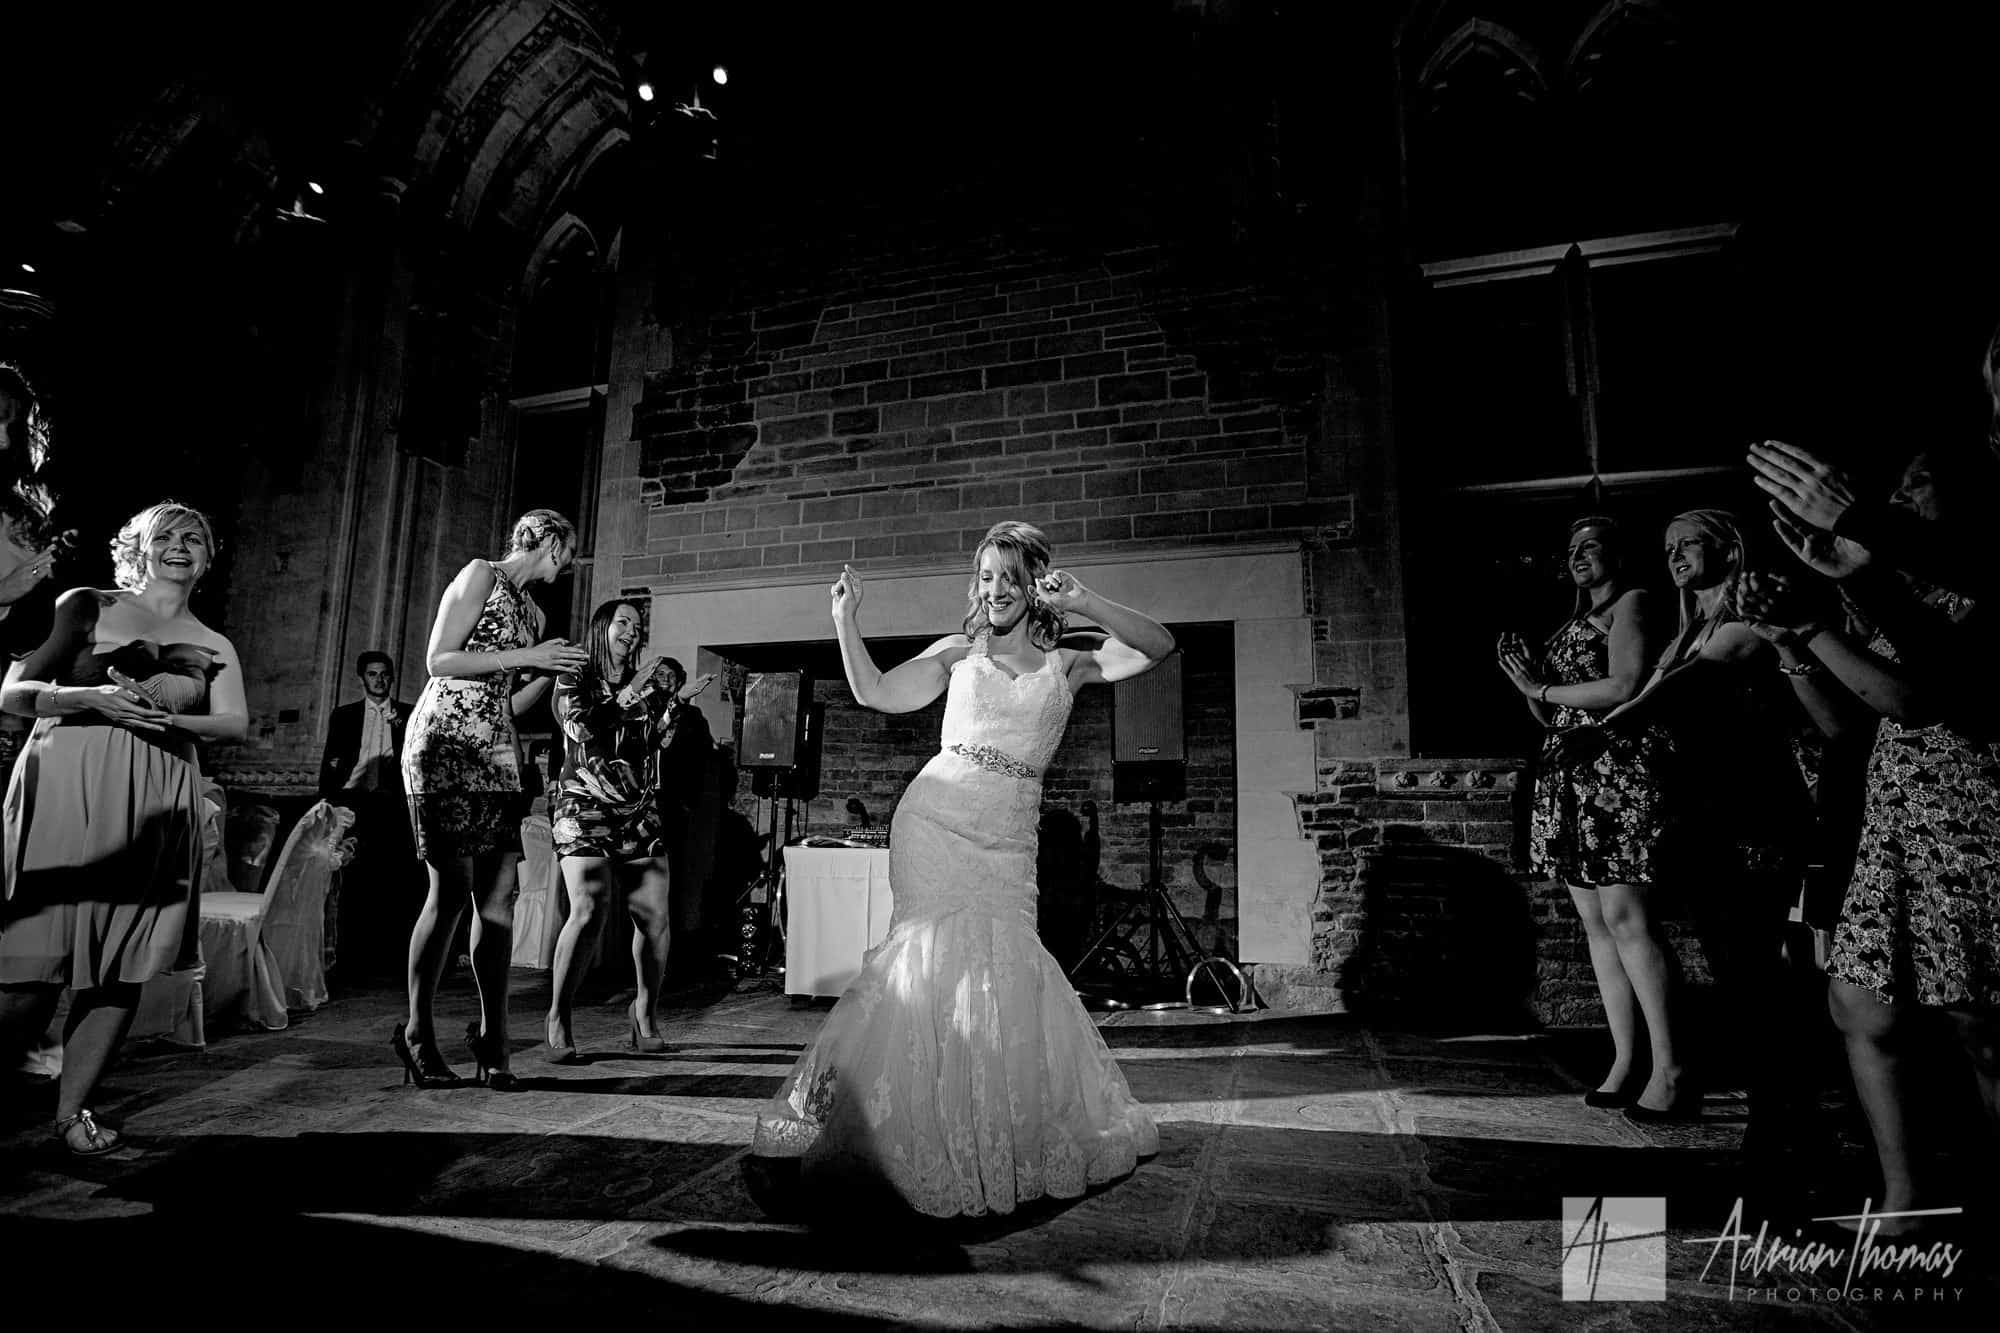 Bride Dancing at her wedding.